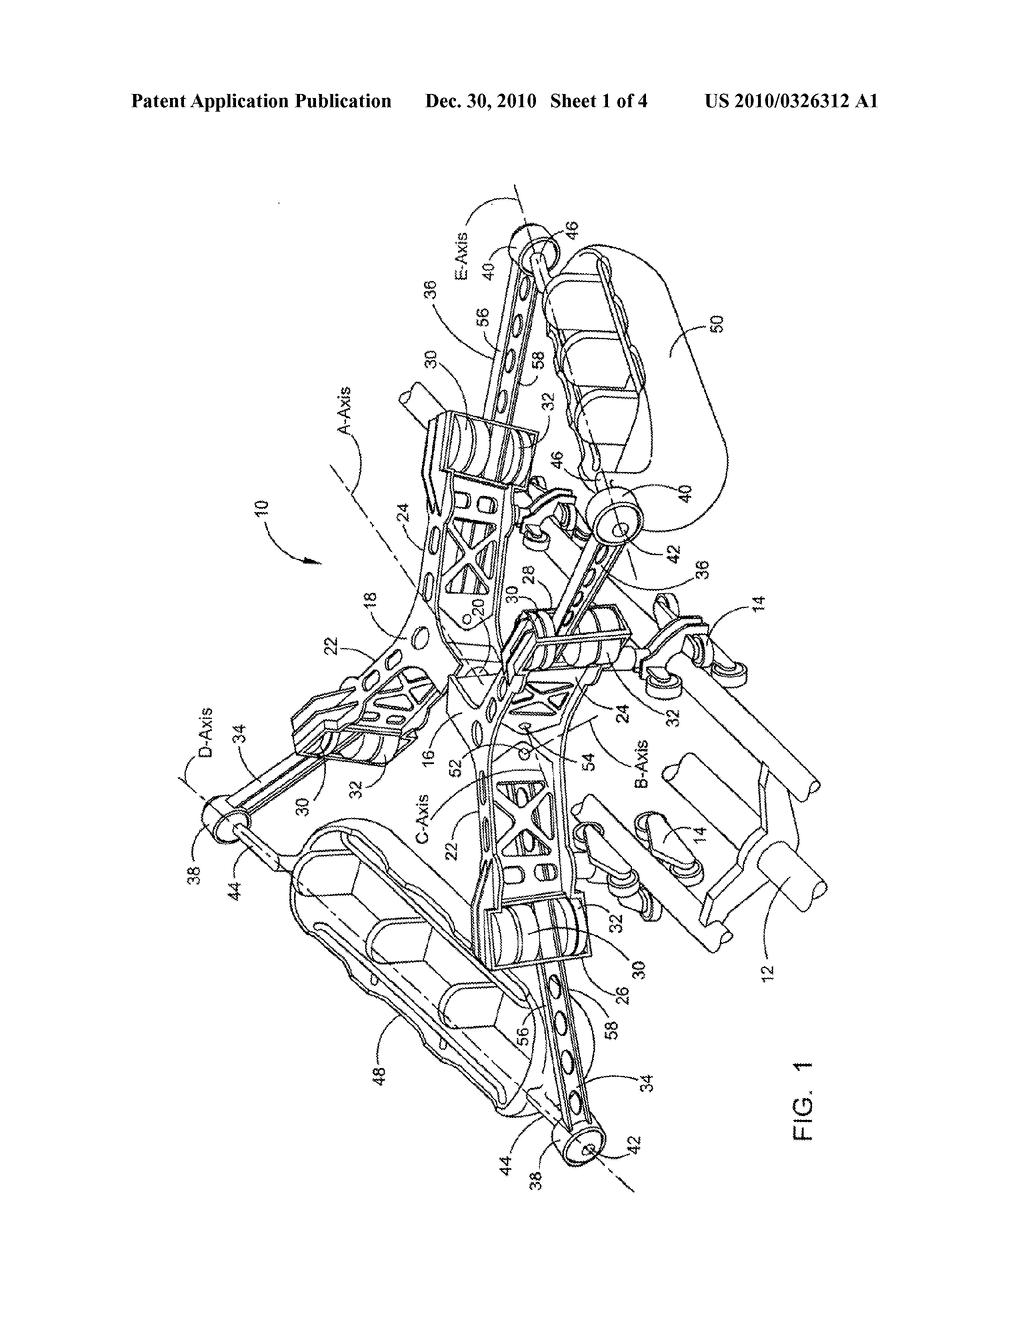 Sensational Longitudinally Spinning Suspension Roller Coaster Diagram Wiring Digital Resources Funapmognl